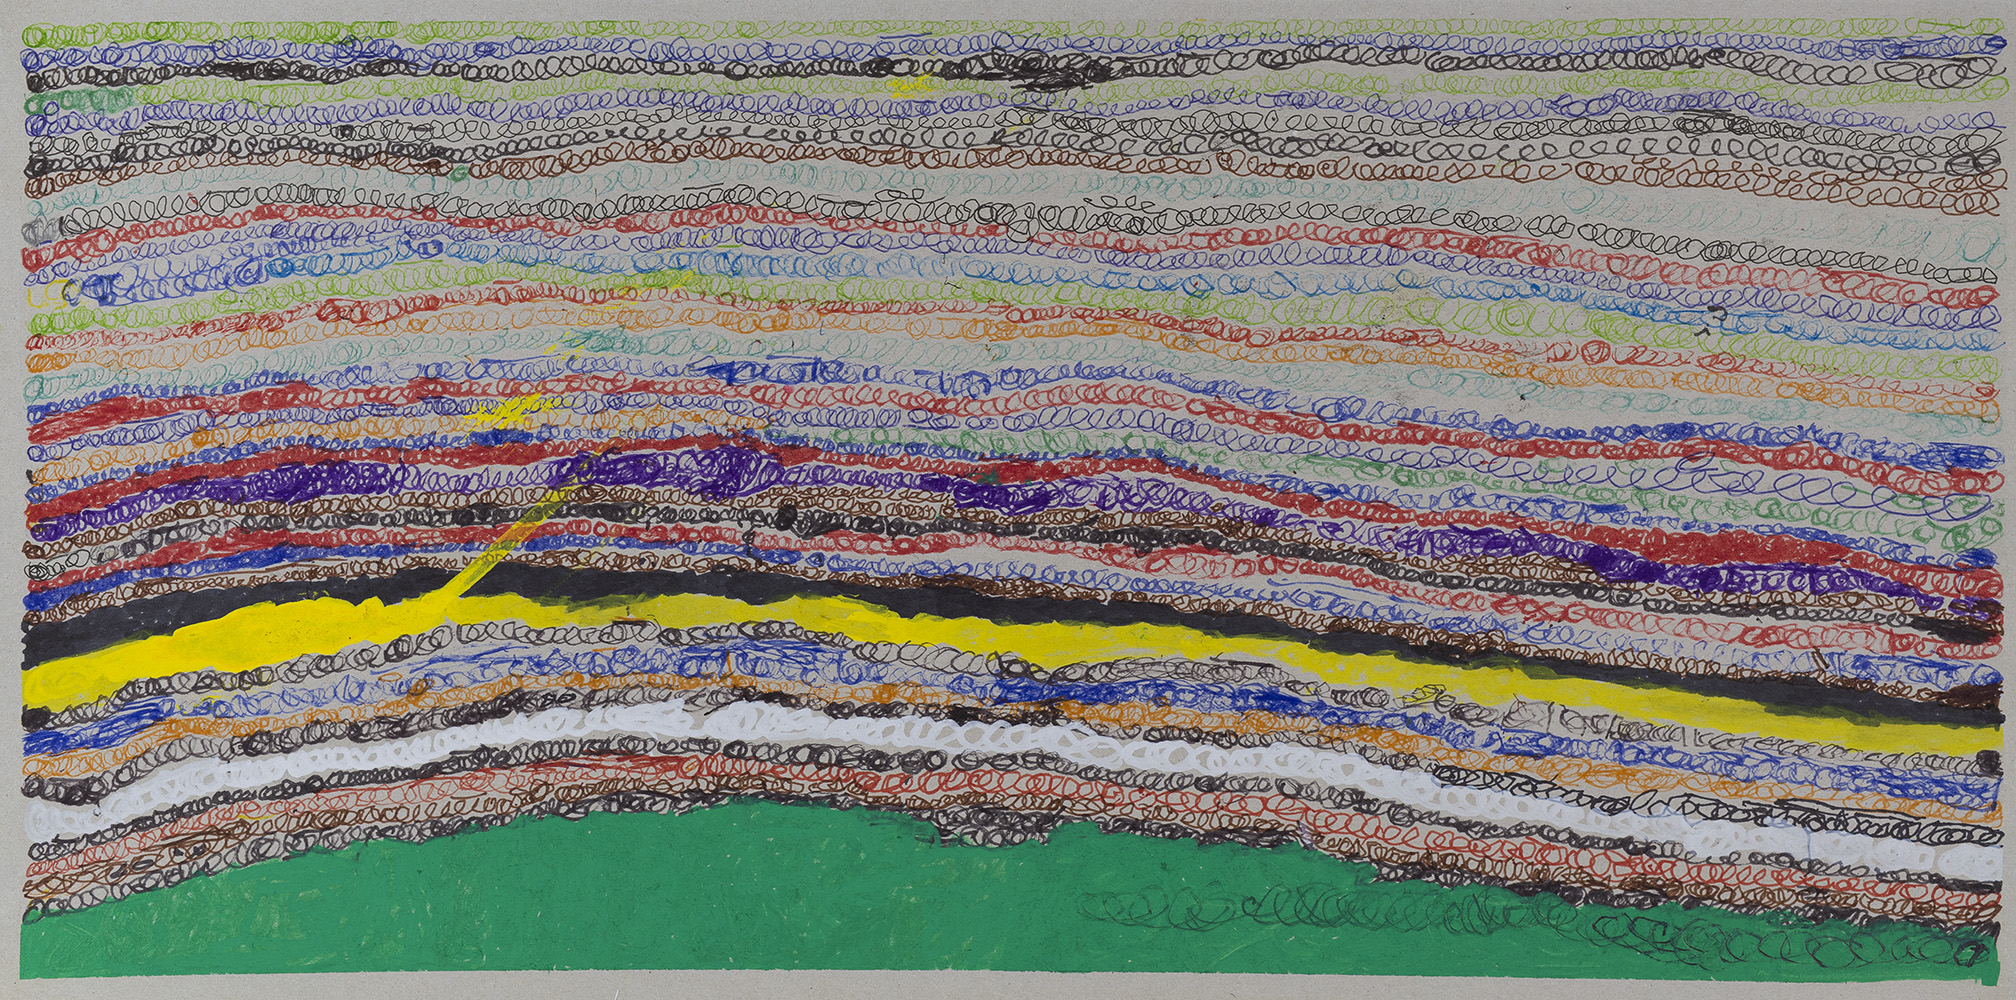 Joseph Lambert    Untitled  , 2014 Mixed media on paper 10.12 x 20.24 inches 25.7 x 51.4 cm JLam 11